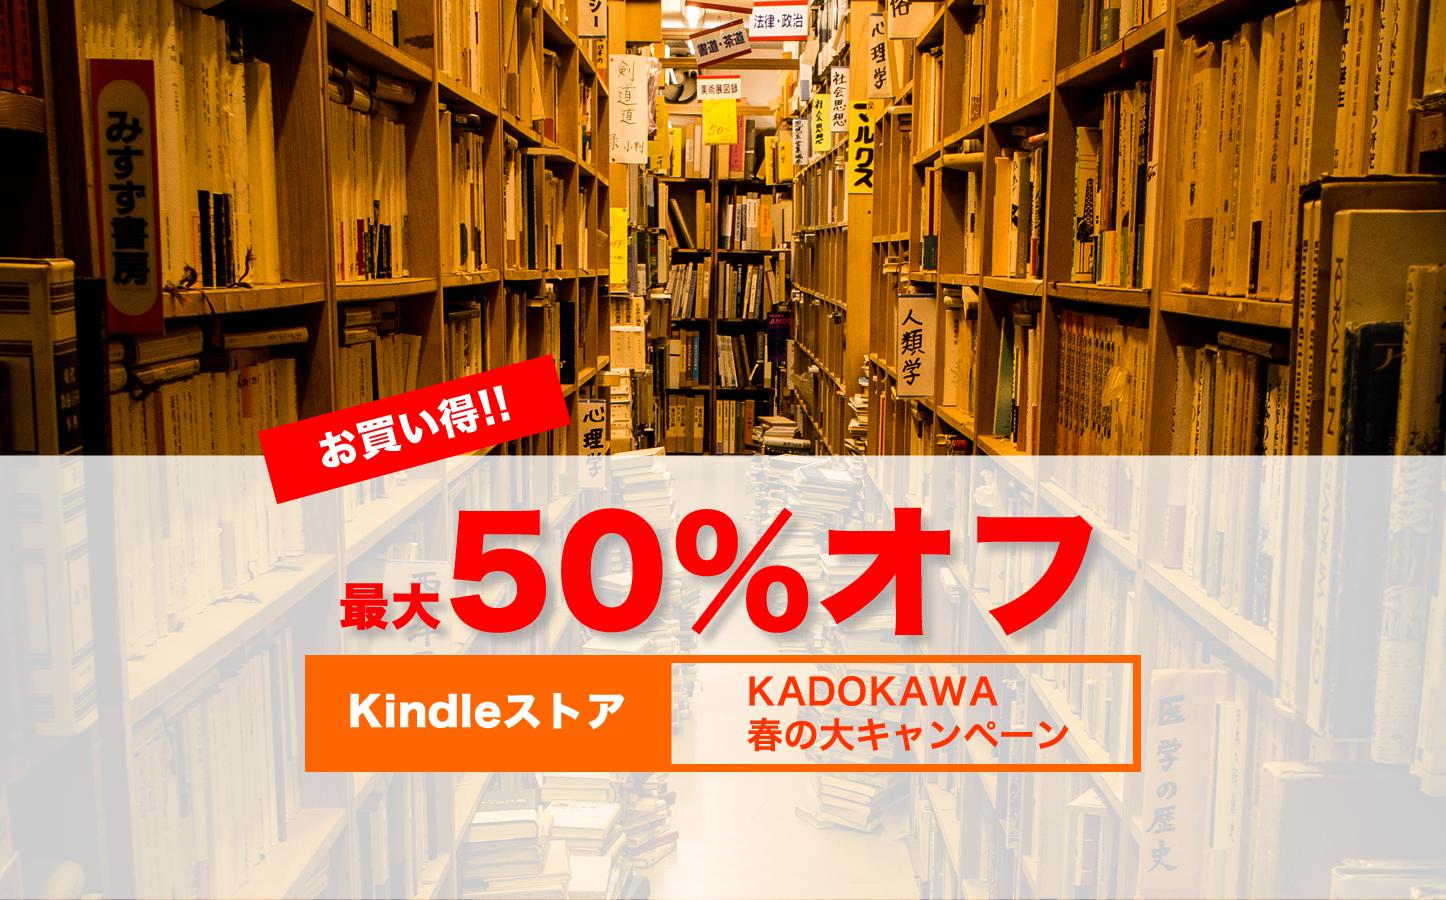 「KADOKAWA春の大キャンペーン」